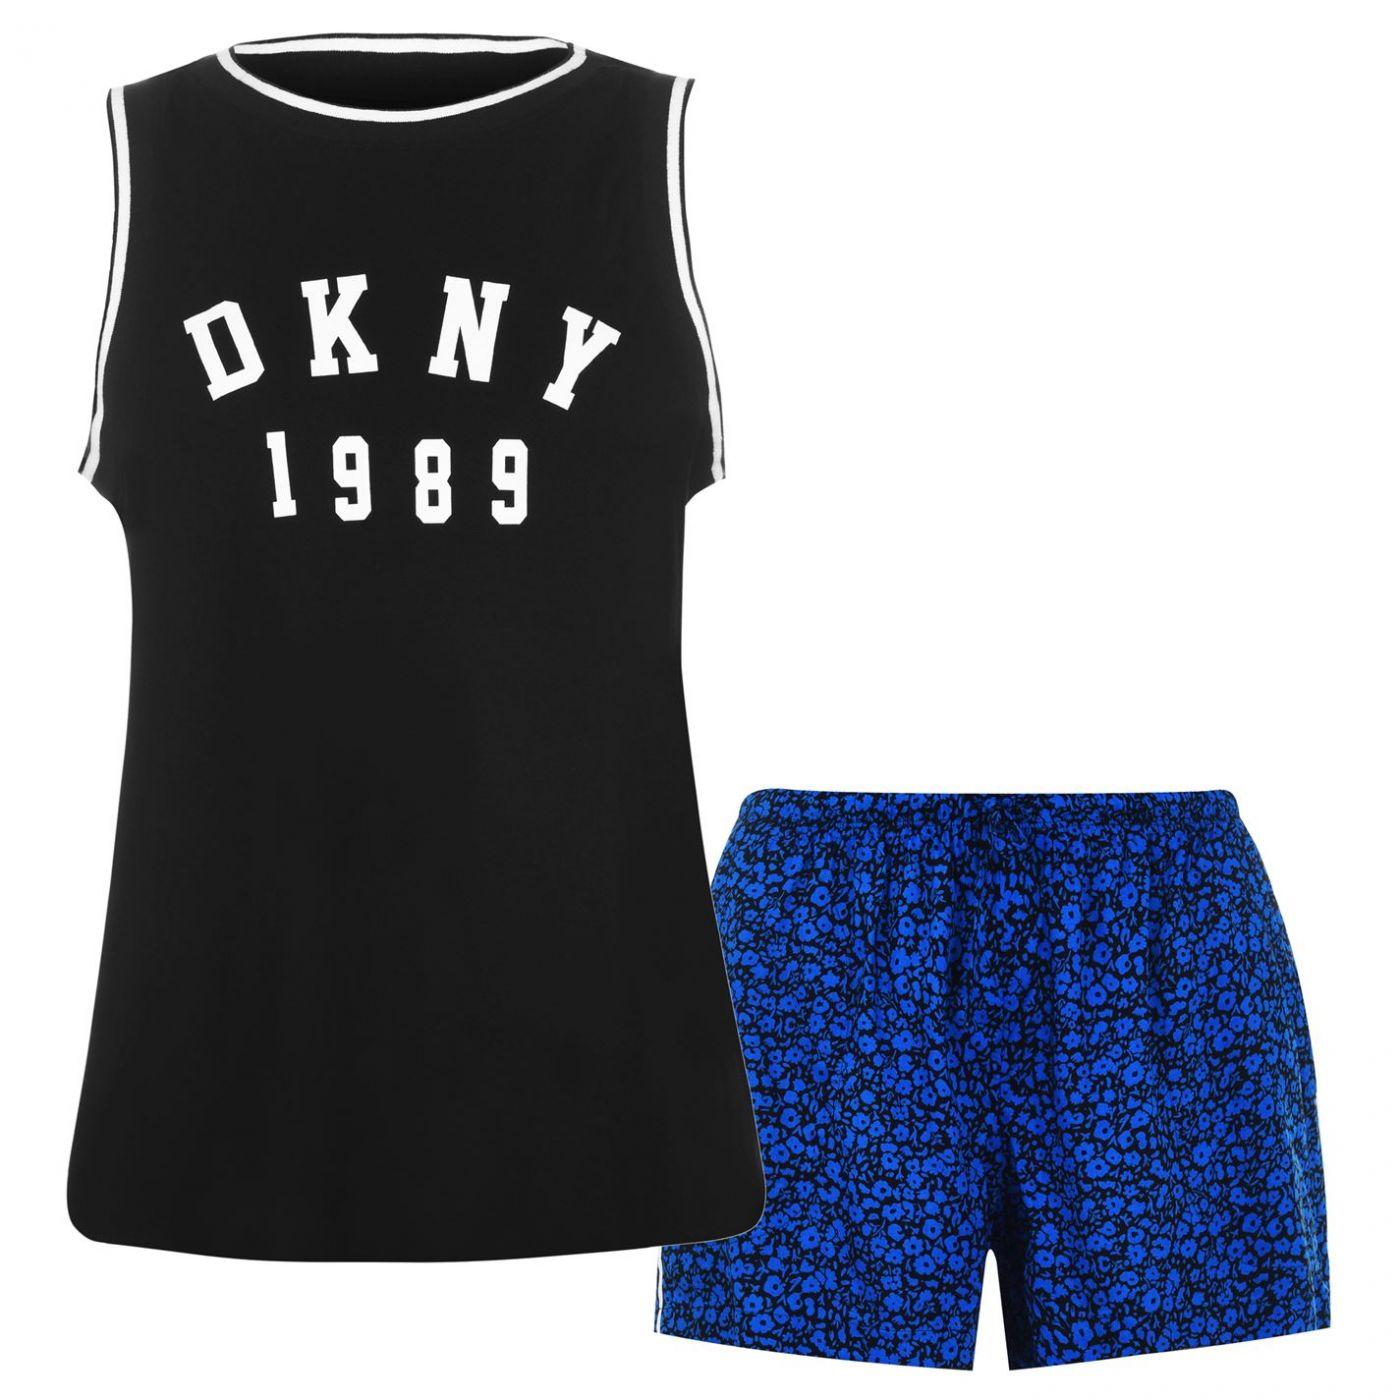 DKNY Logo Tank Set Ld02